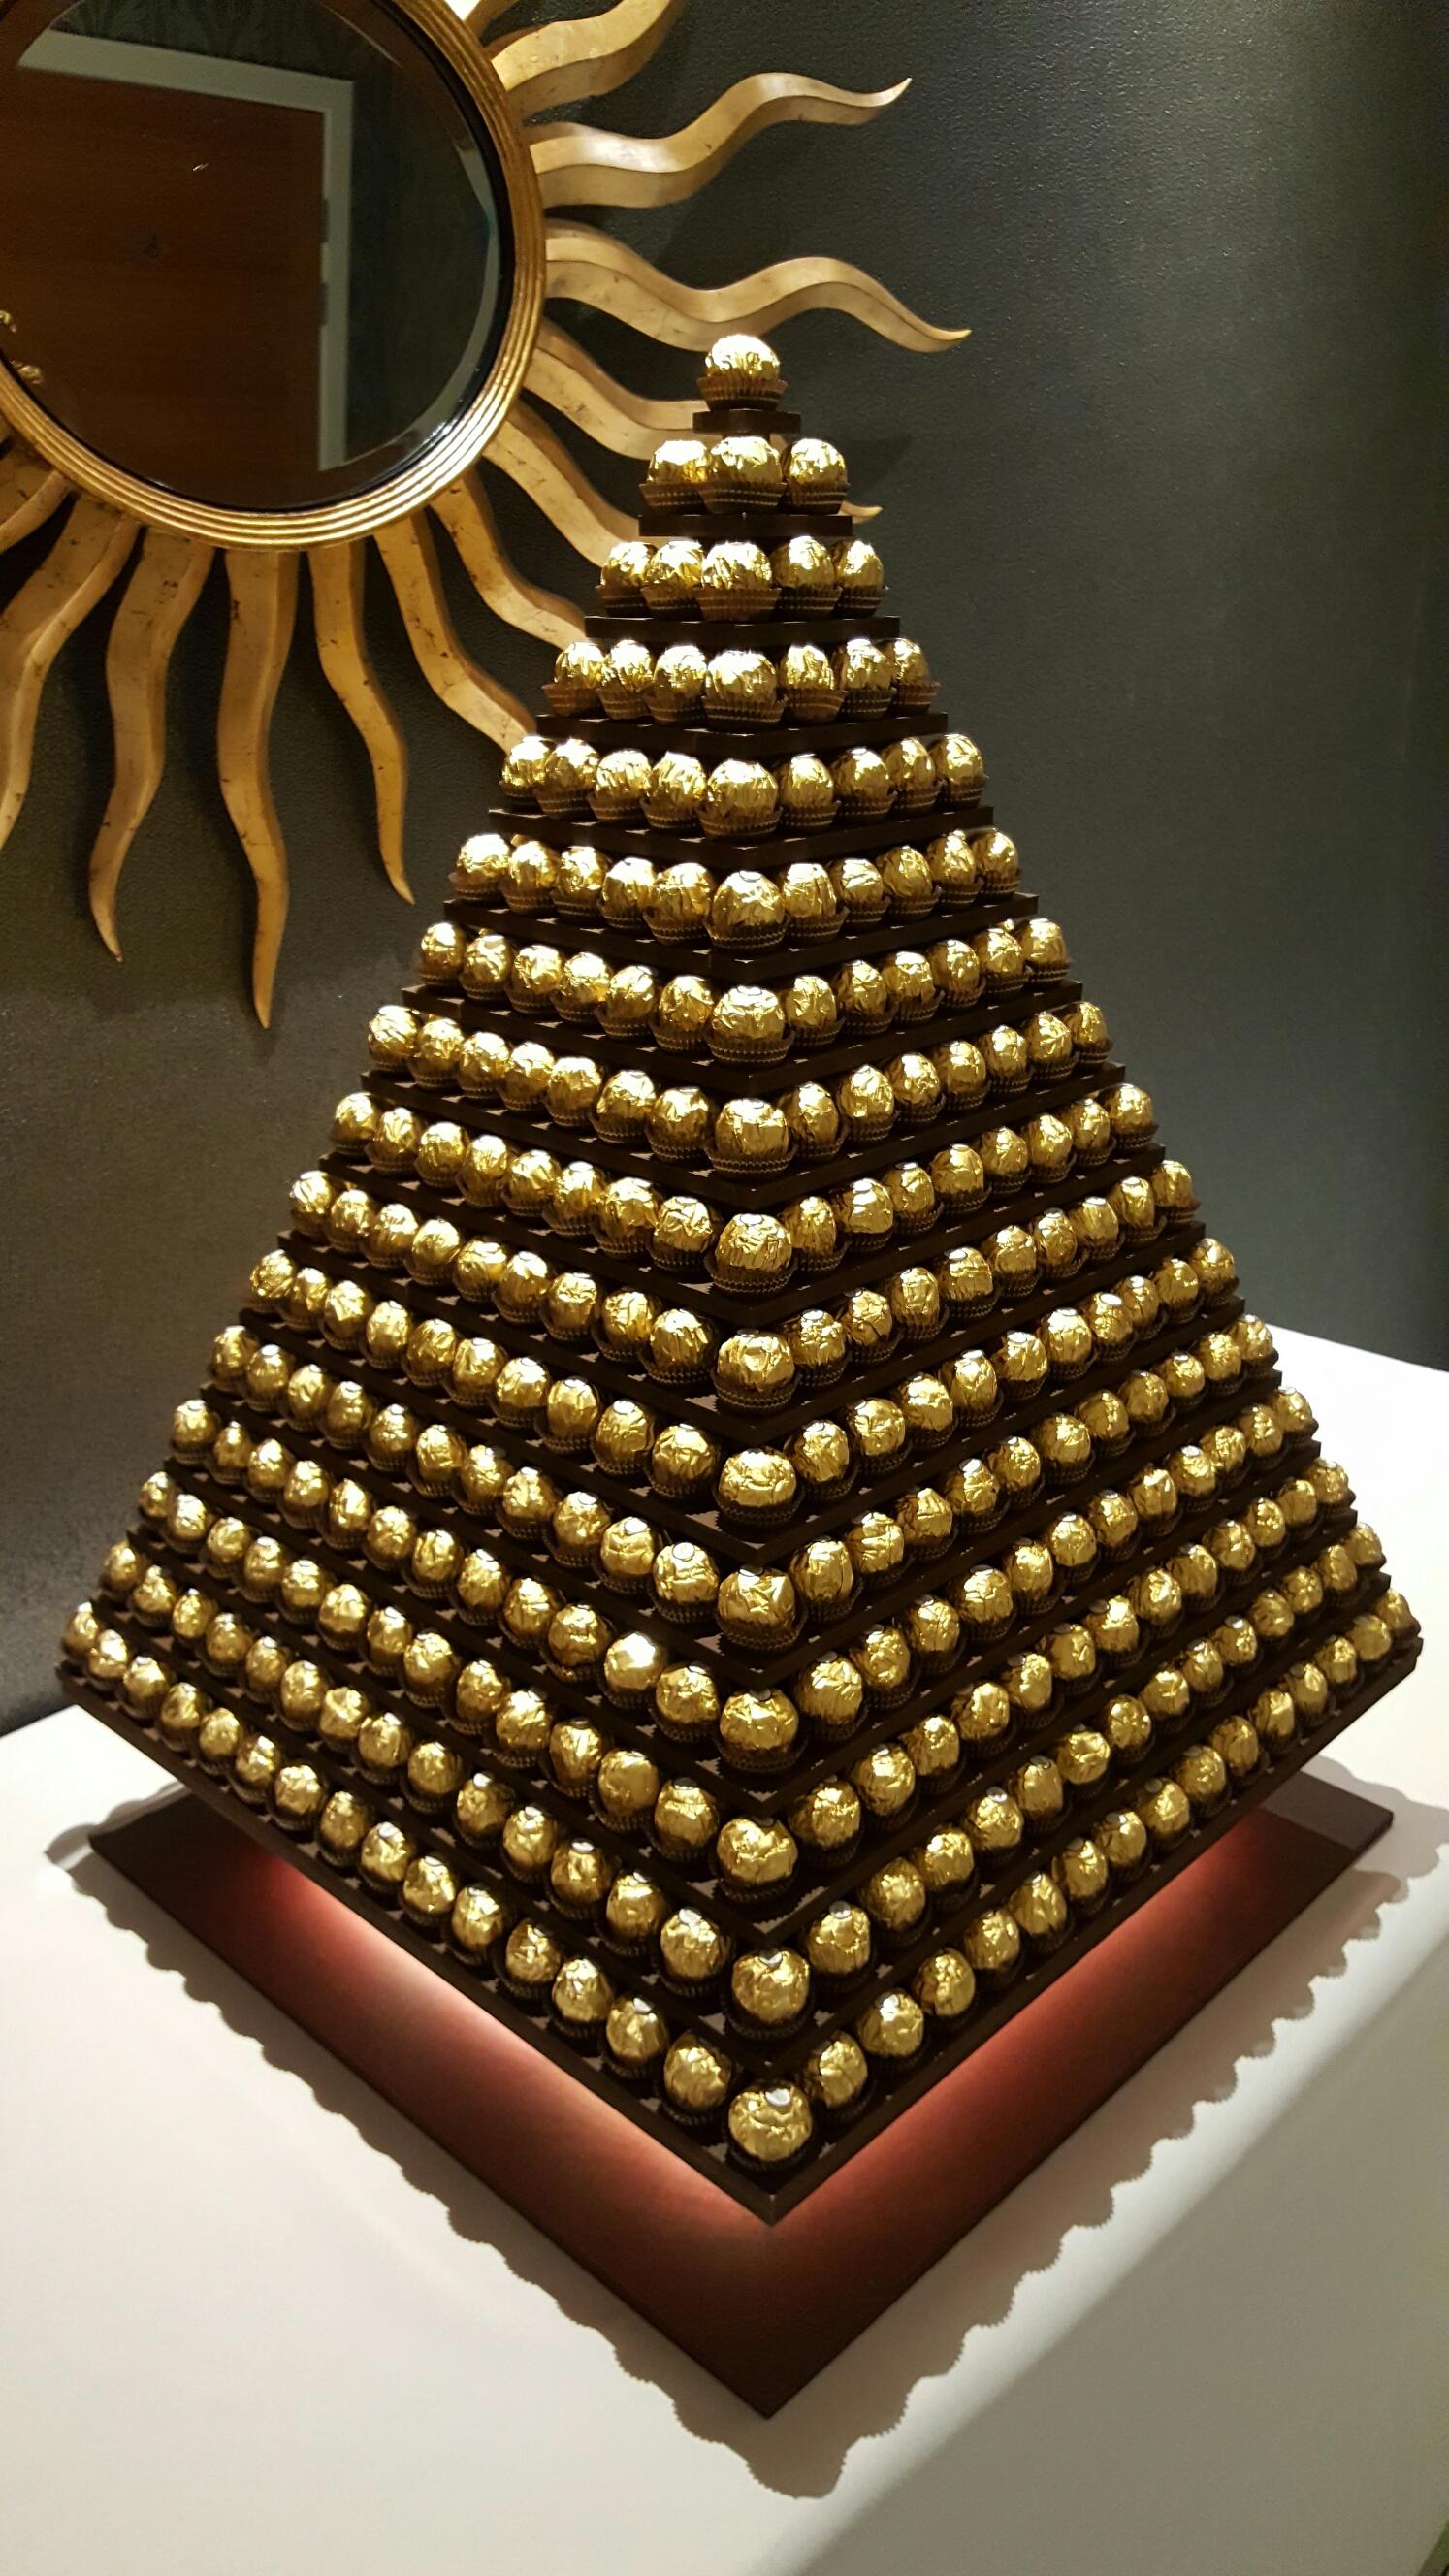 Pyramid Ferrero tower